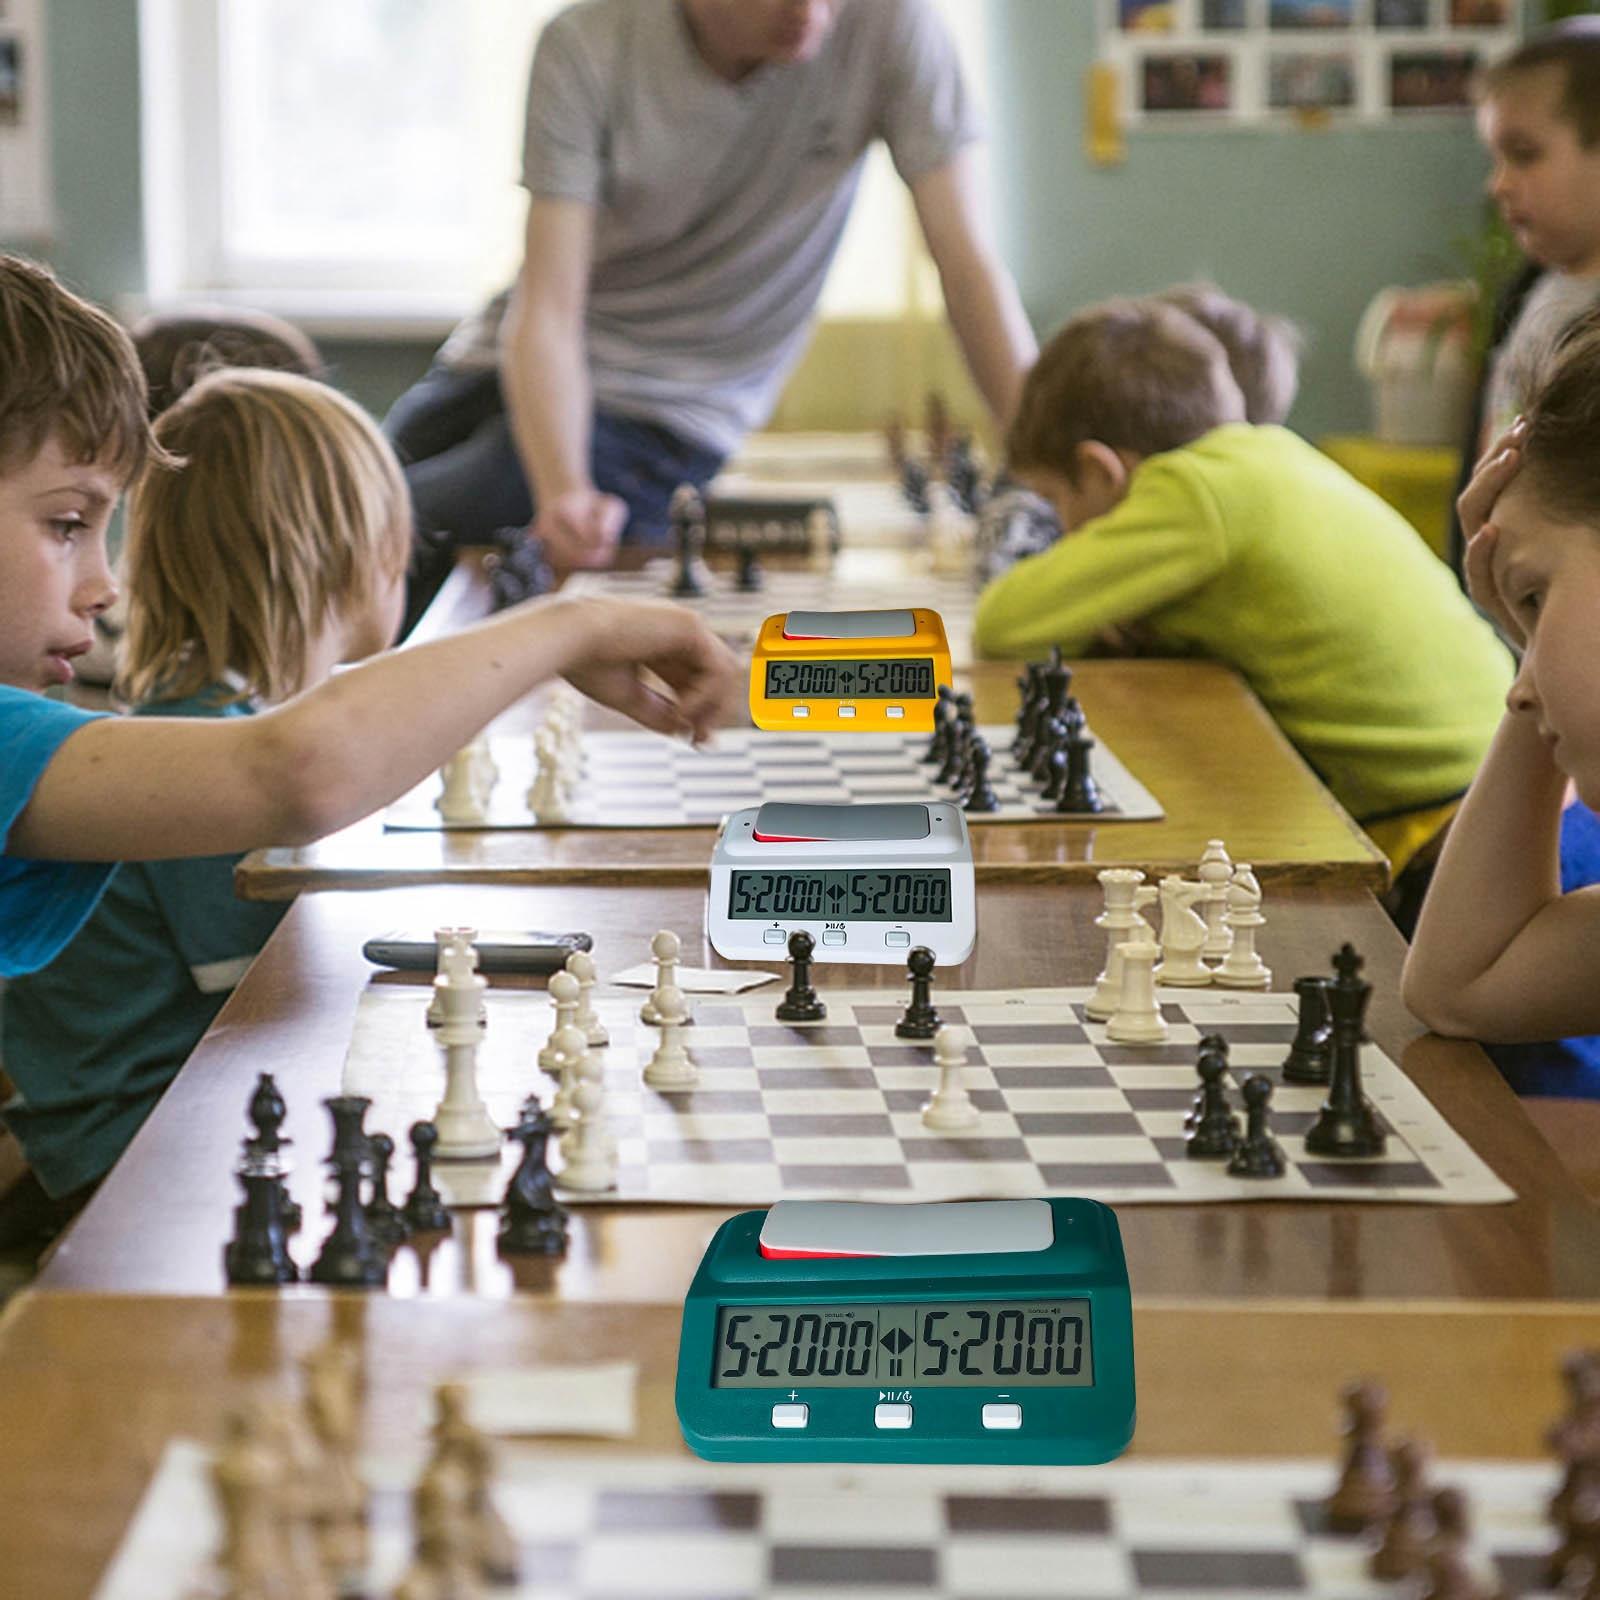 relogio de xadrez analogico mecanica relogios xadrez 04